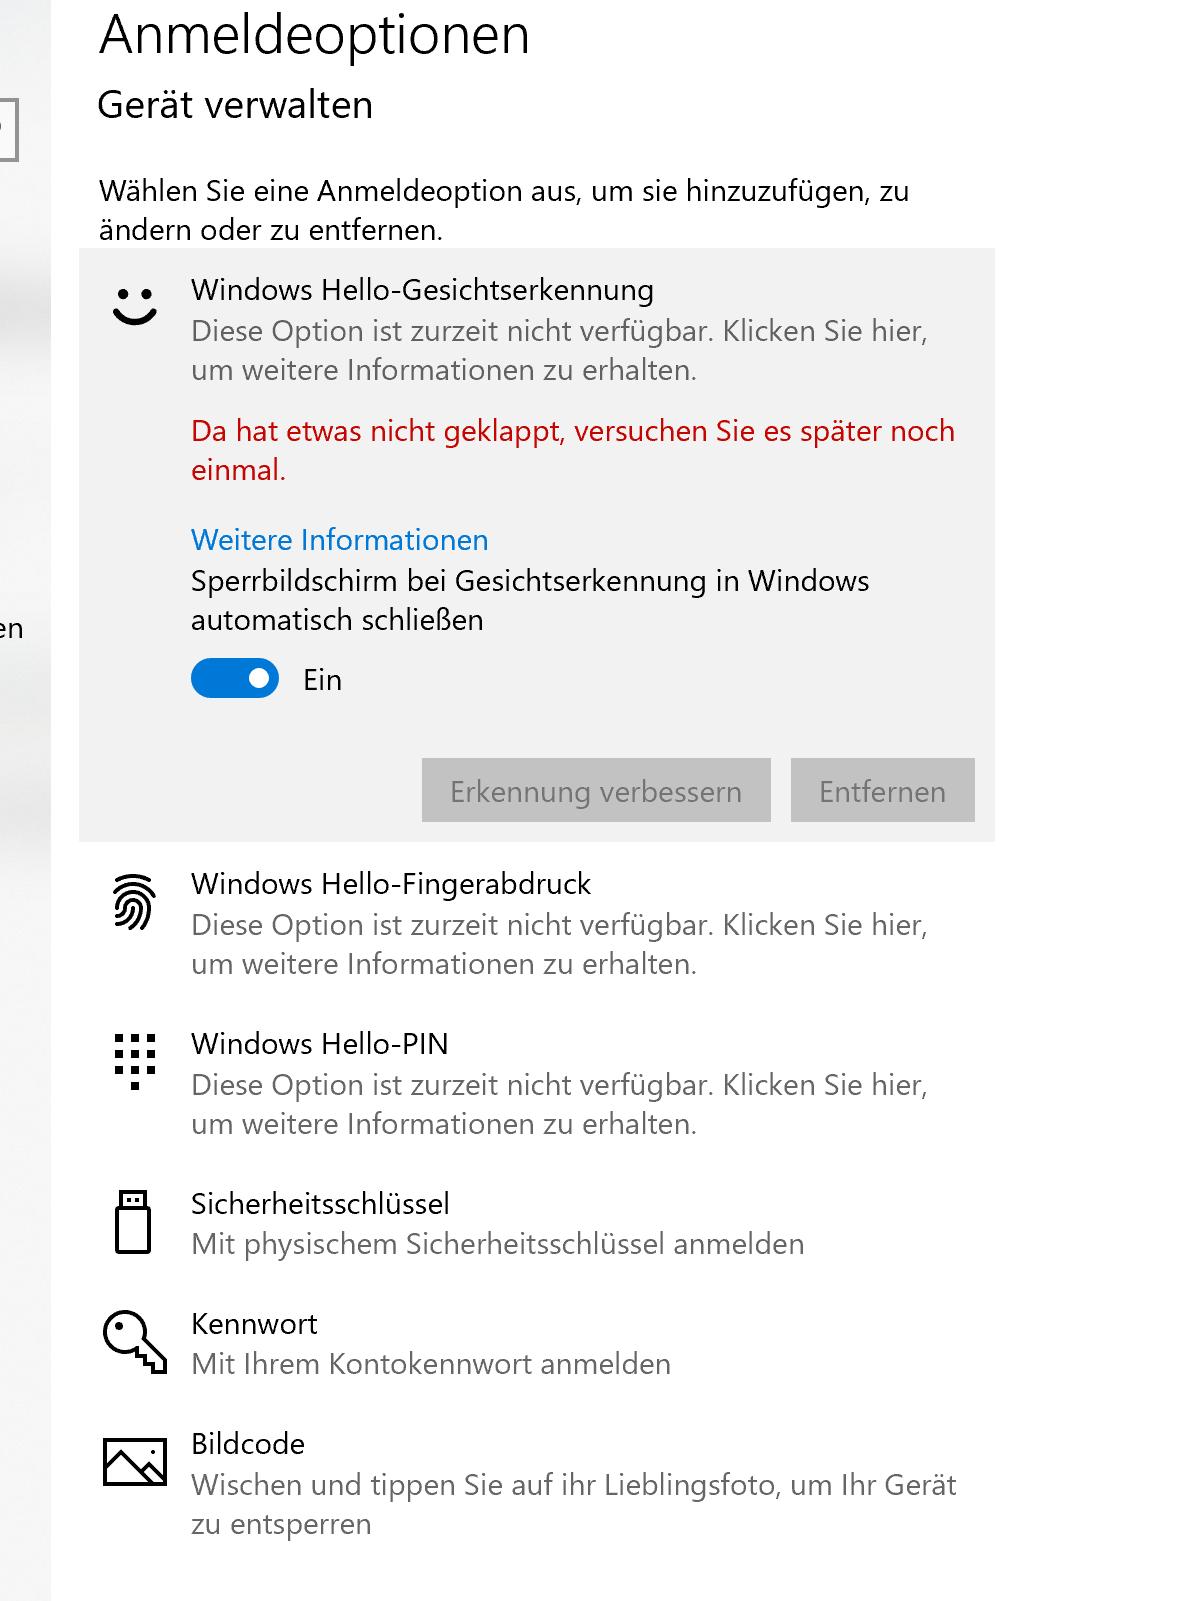 Windows Hello fehlermeldung